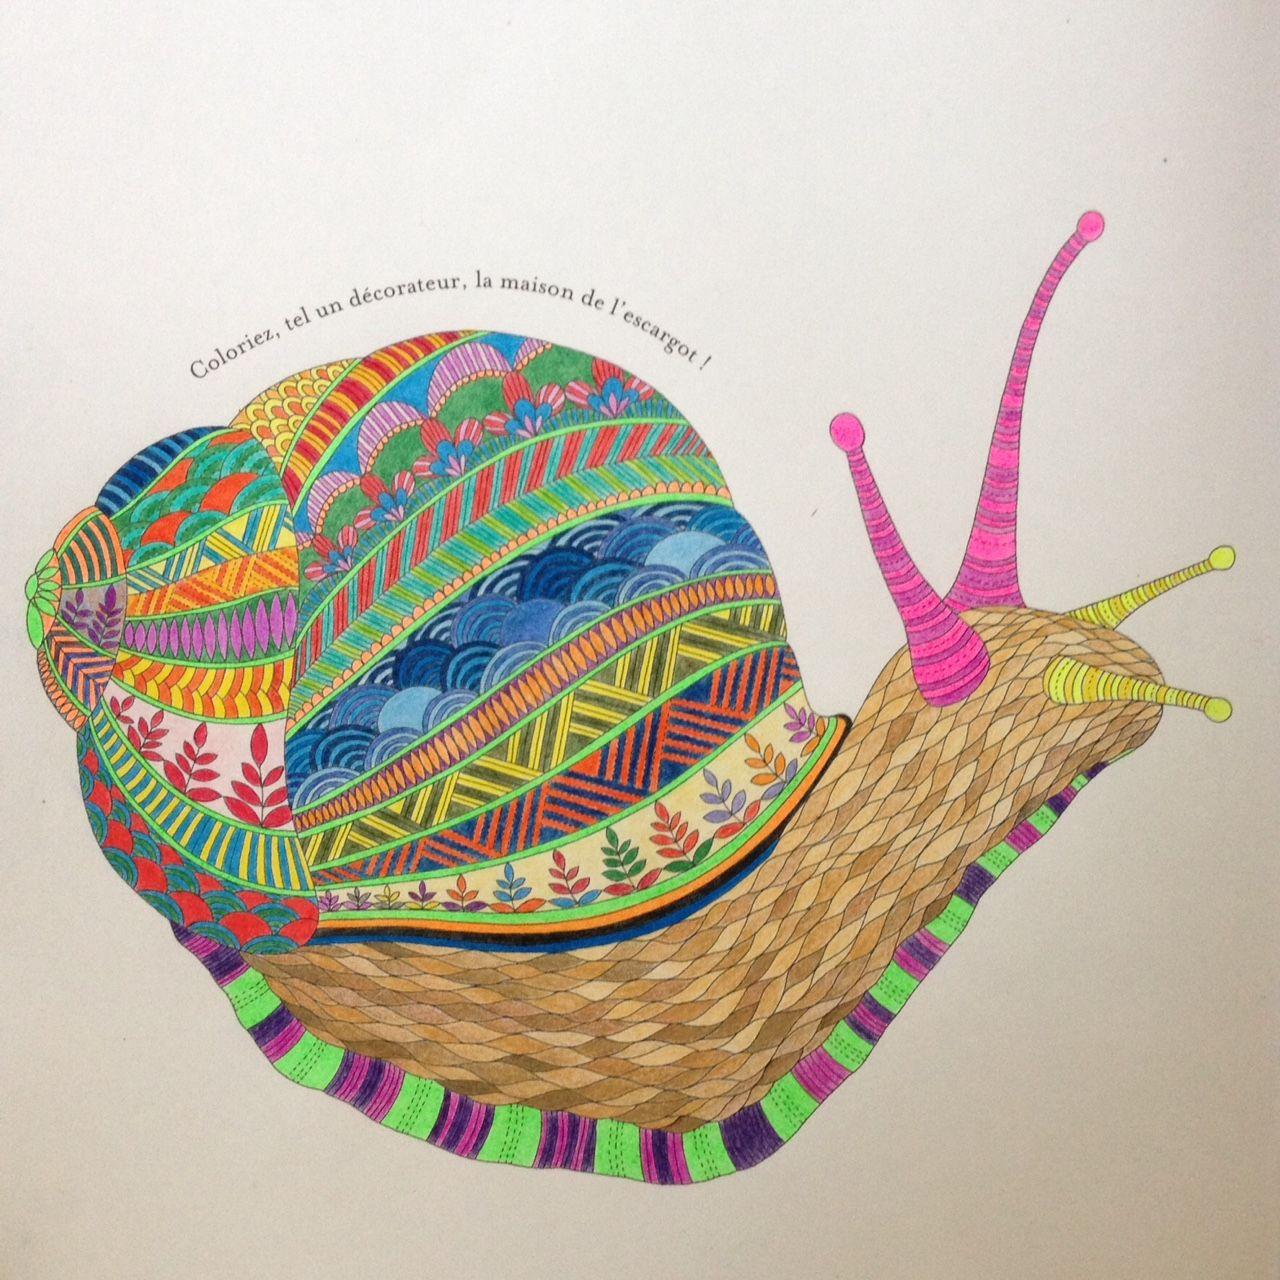 Animal Kingdom Colouring Book Google Search